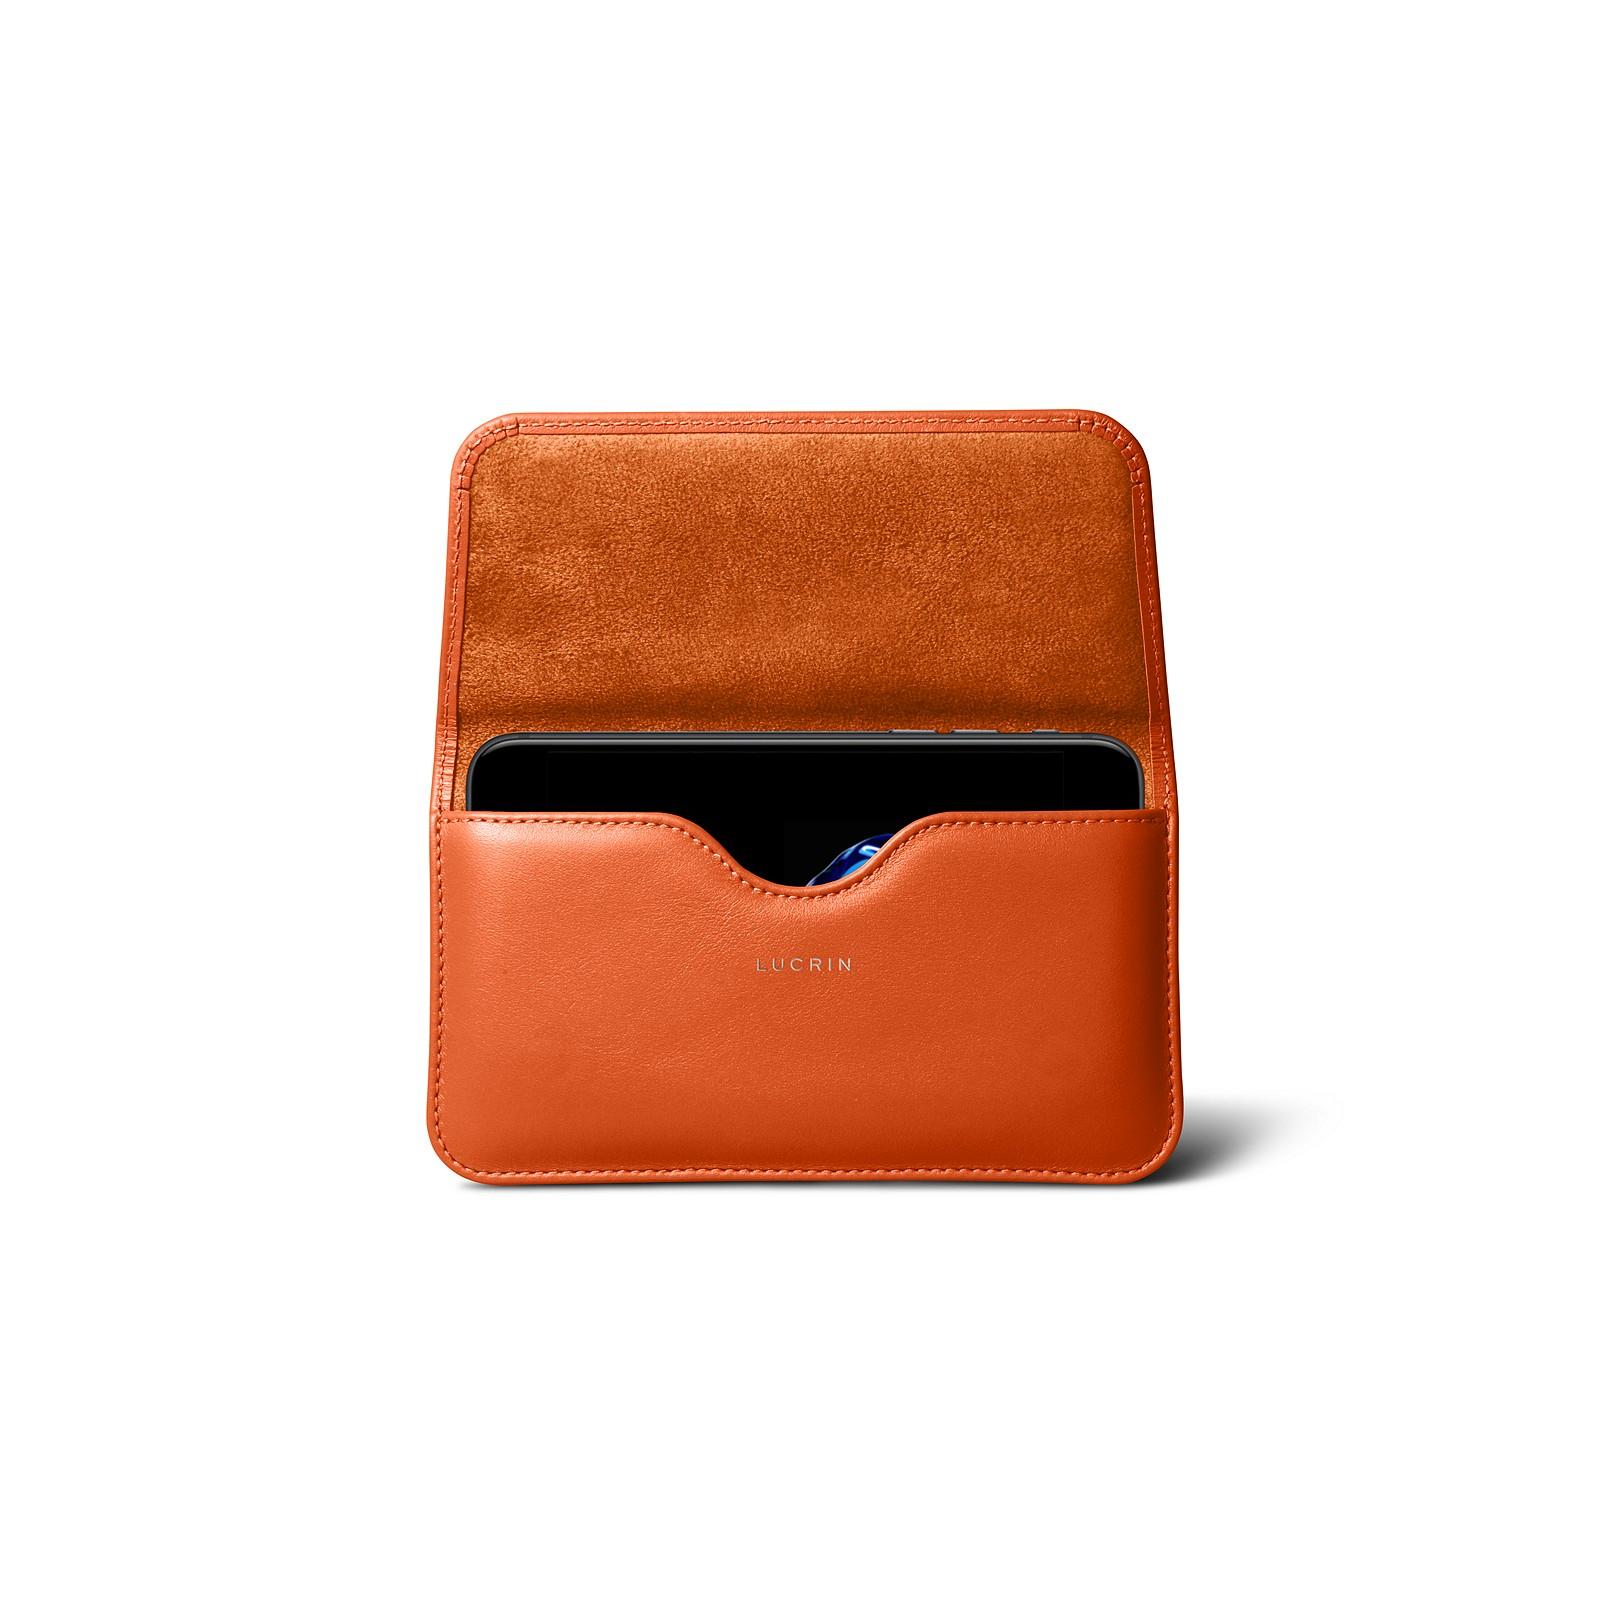 Small Leather Goods - Belts Relish HSUqIya